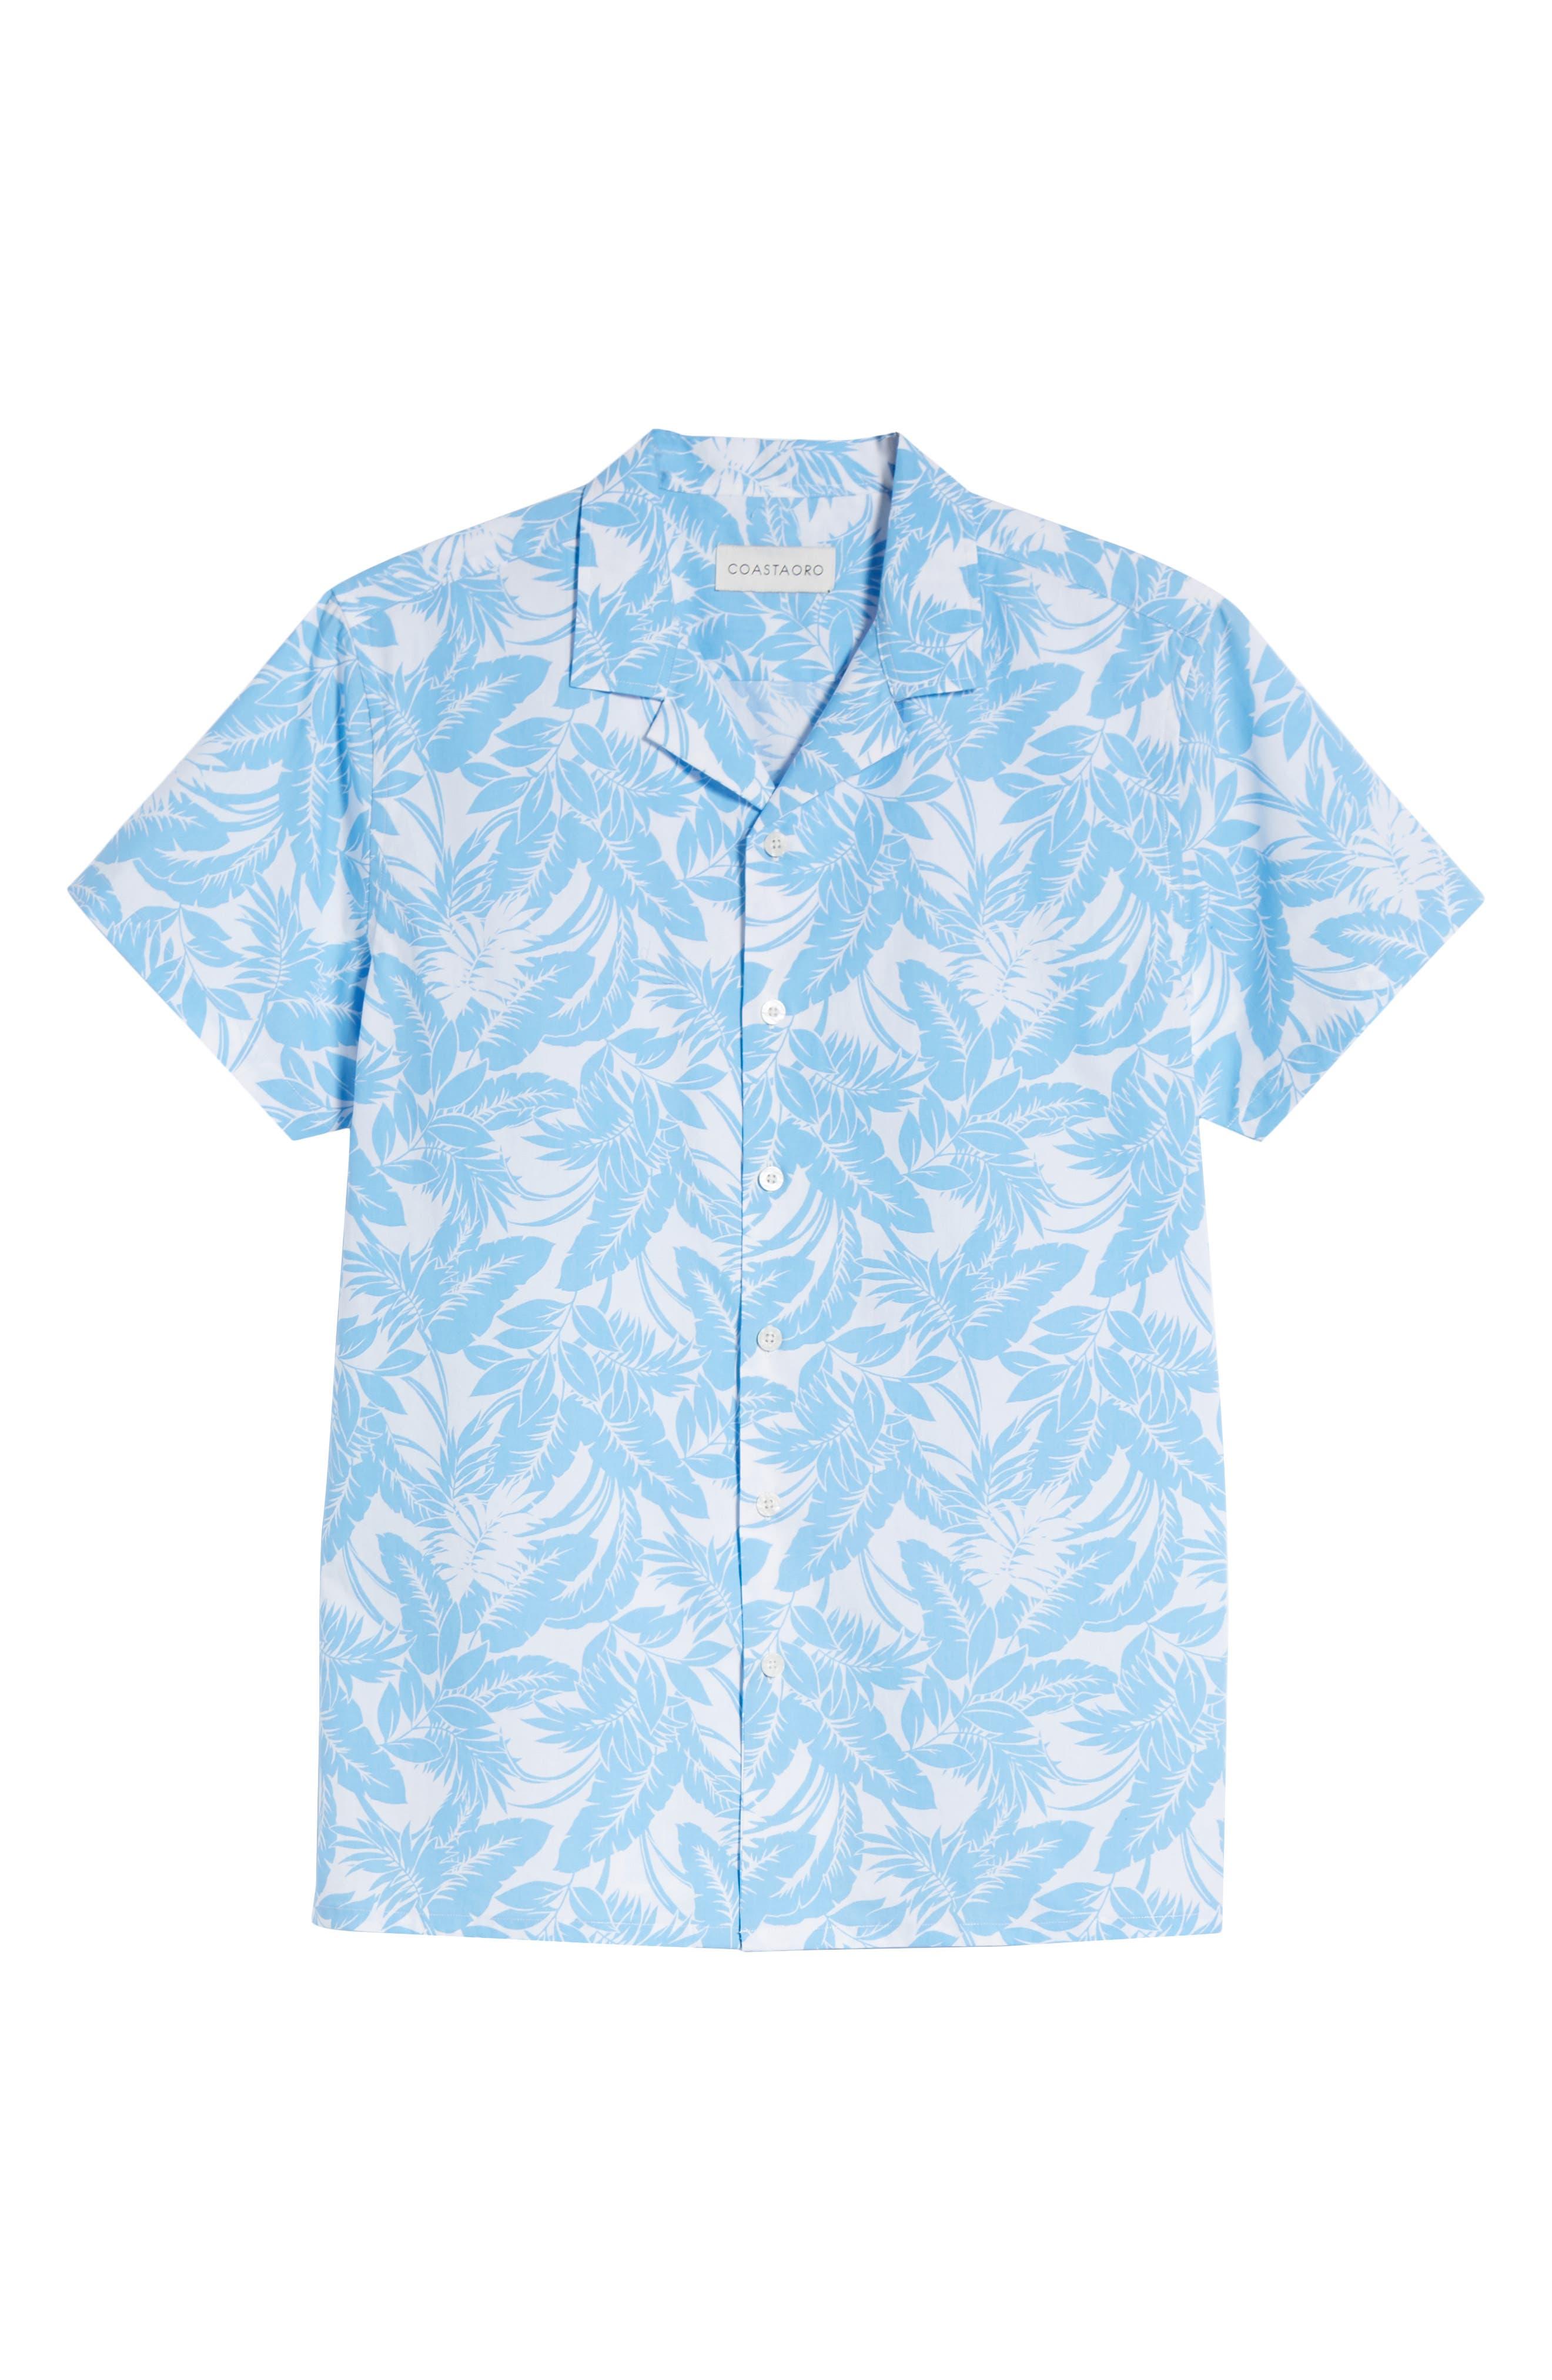 Camp Ventu Regular Fit Short Sleeve Sport Shirt,                             Alternate thumbnail 6, color,                             451